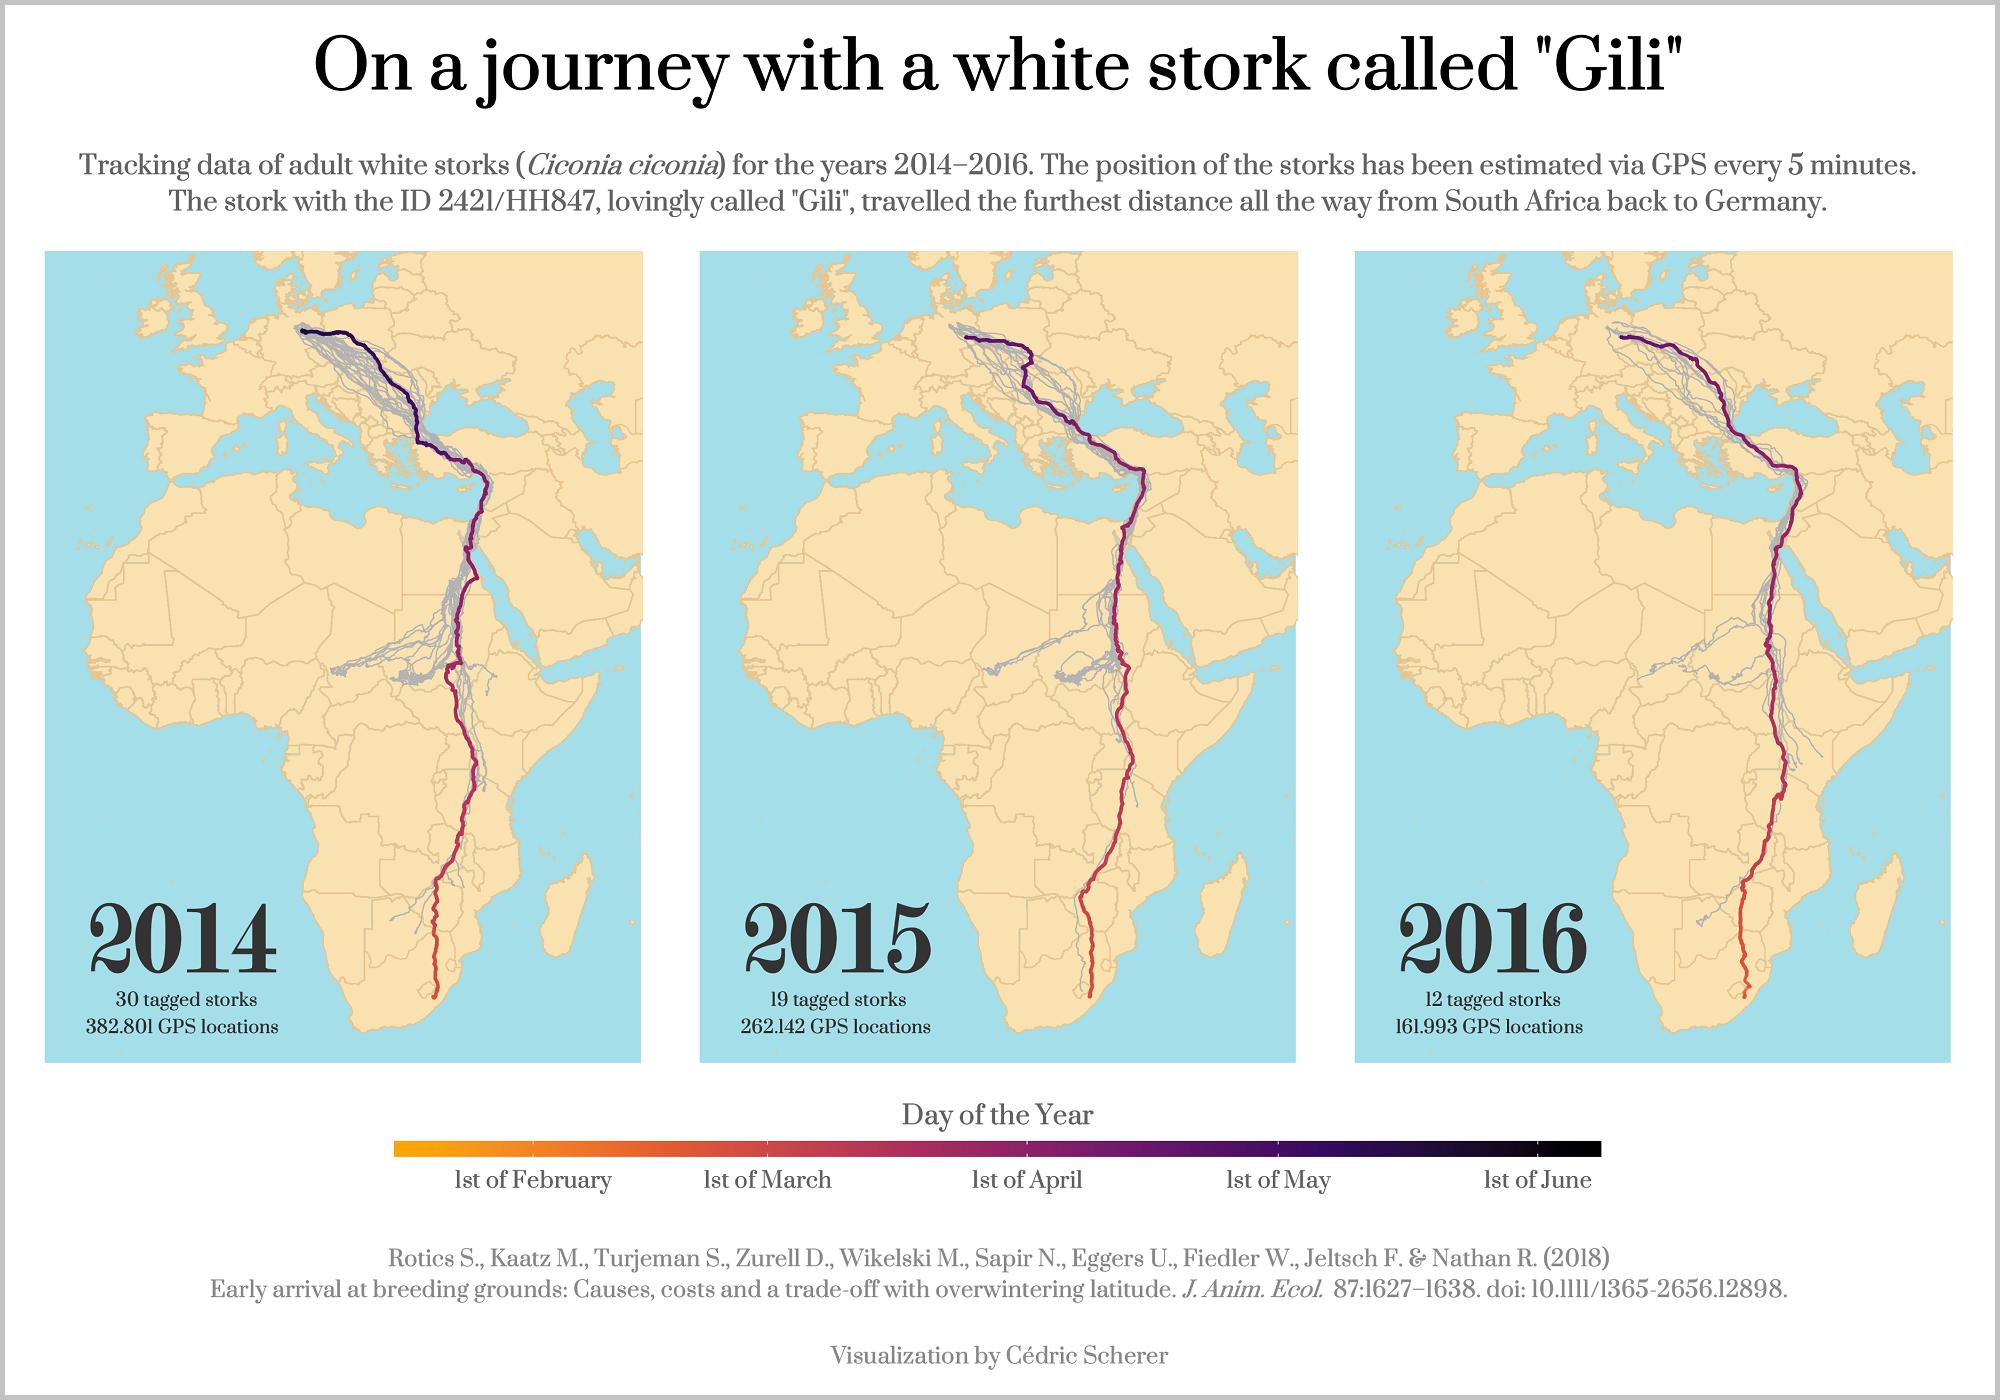 Migration Patterns of White Storks